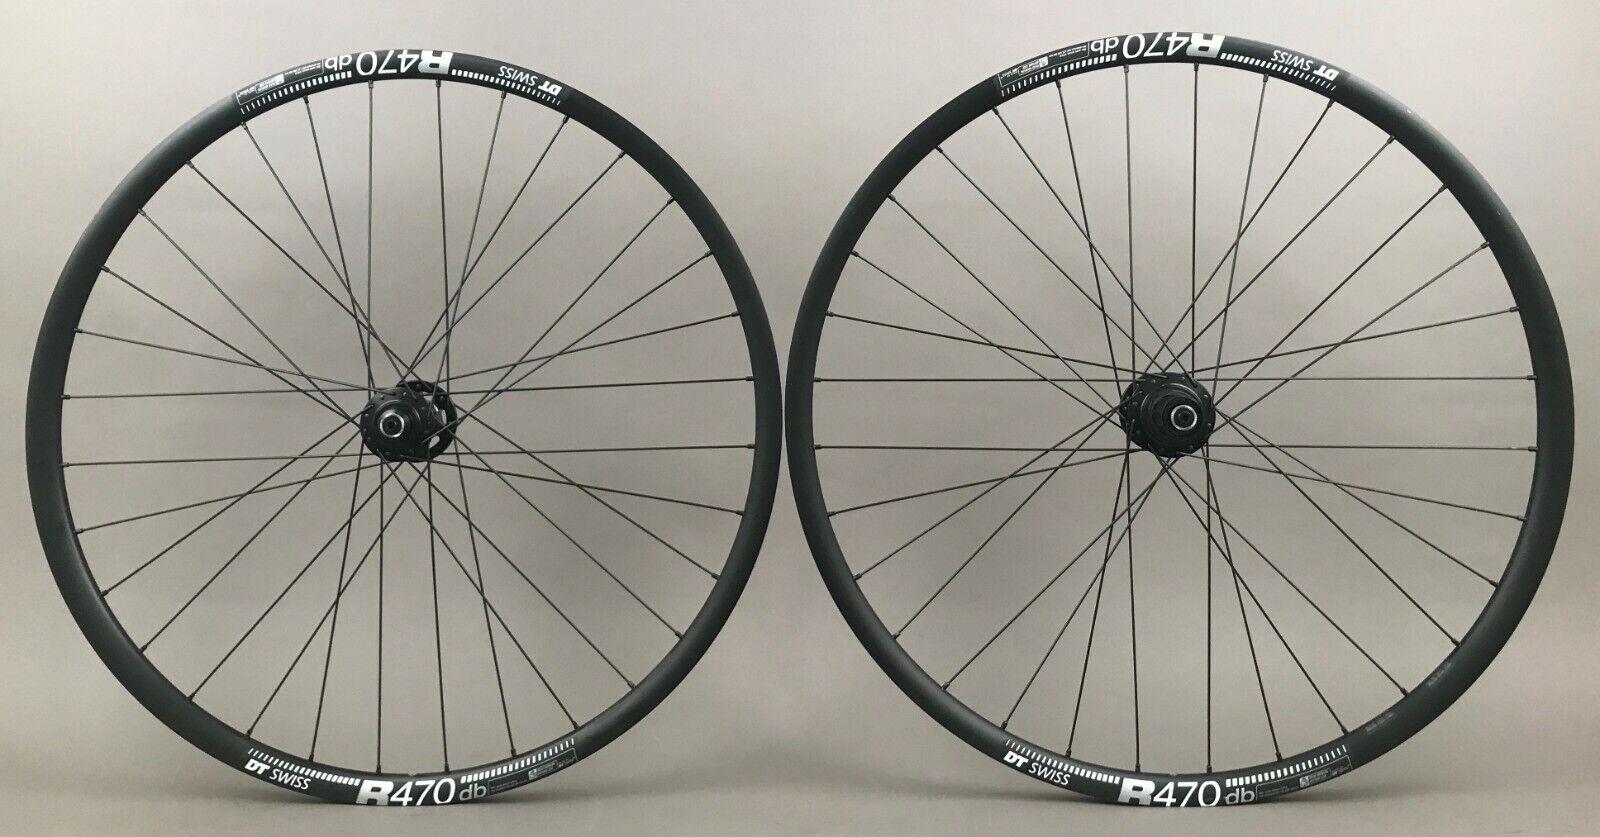 Image 1 - DT R470 Road CX Gravel Bike Disc Brake Wheelset SRAM 900 Hubs 8 9 10 11 Speed